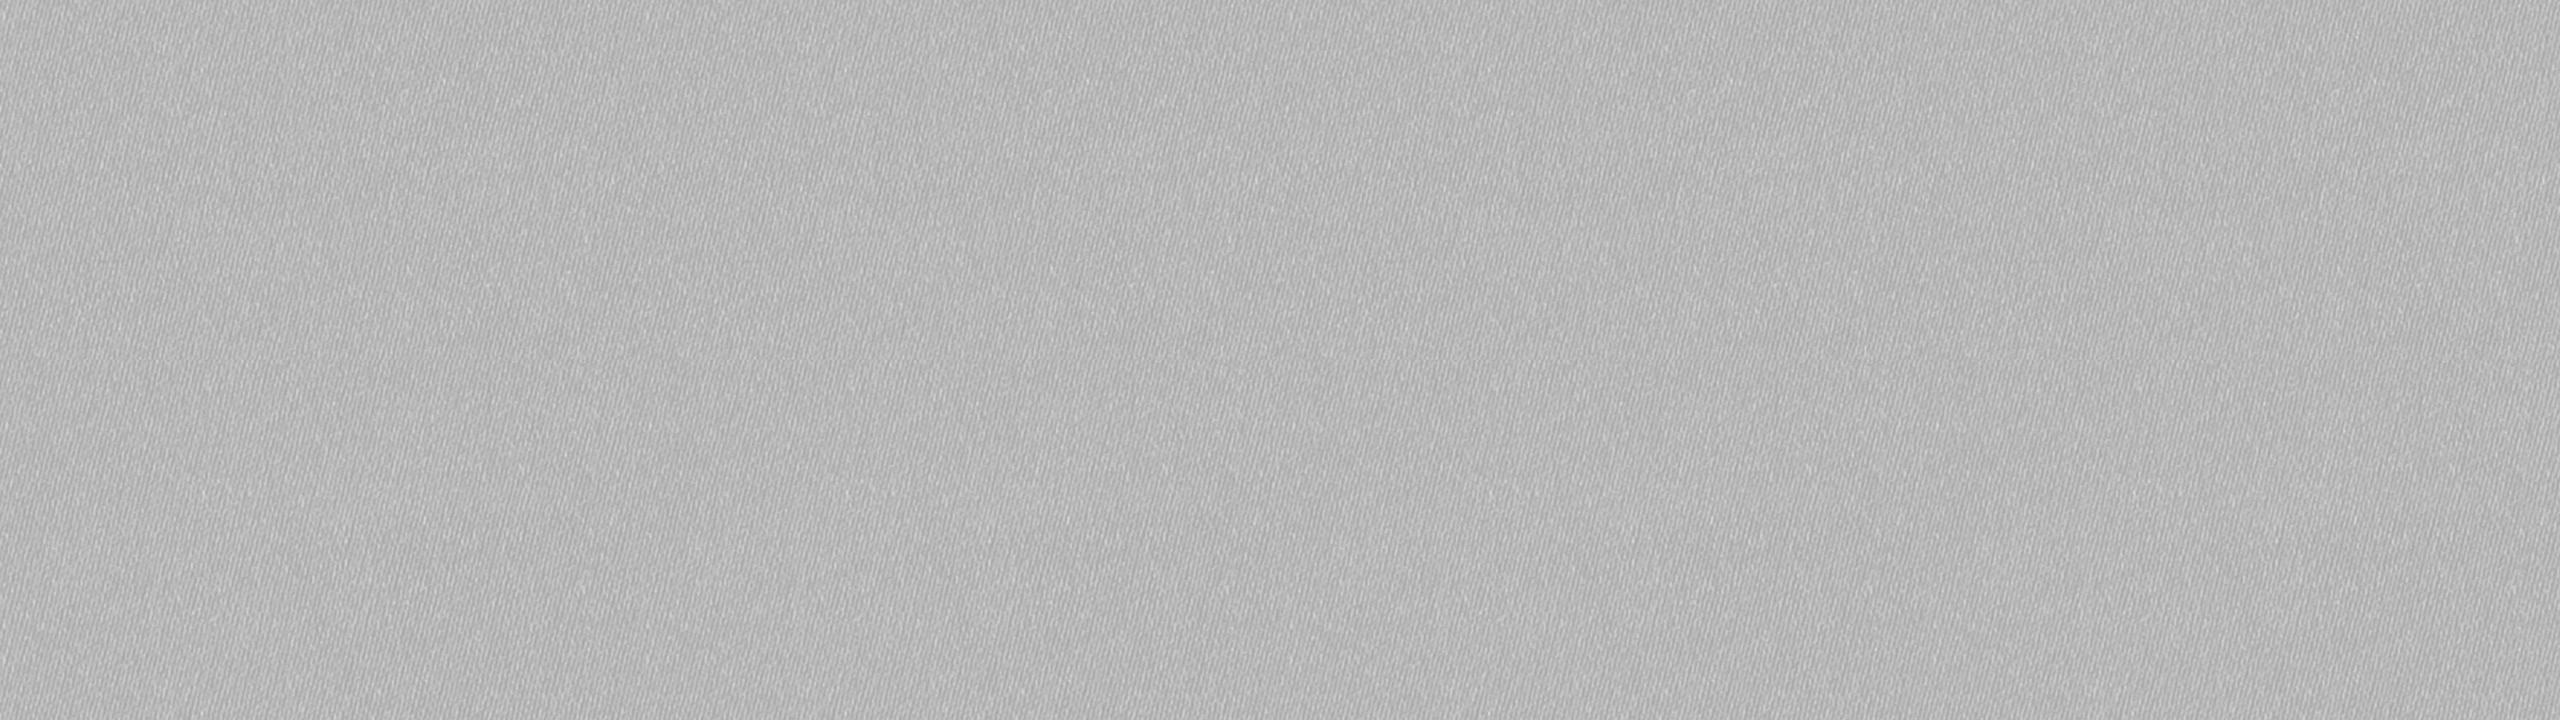 venezia-однотон-09